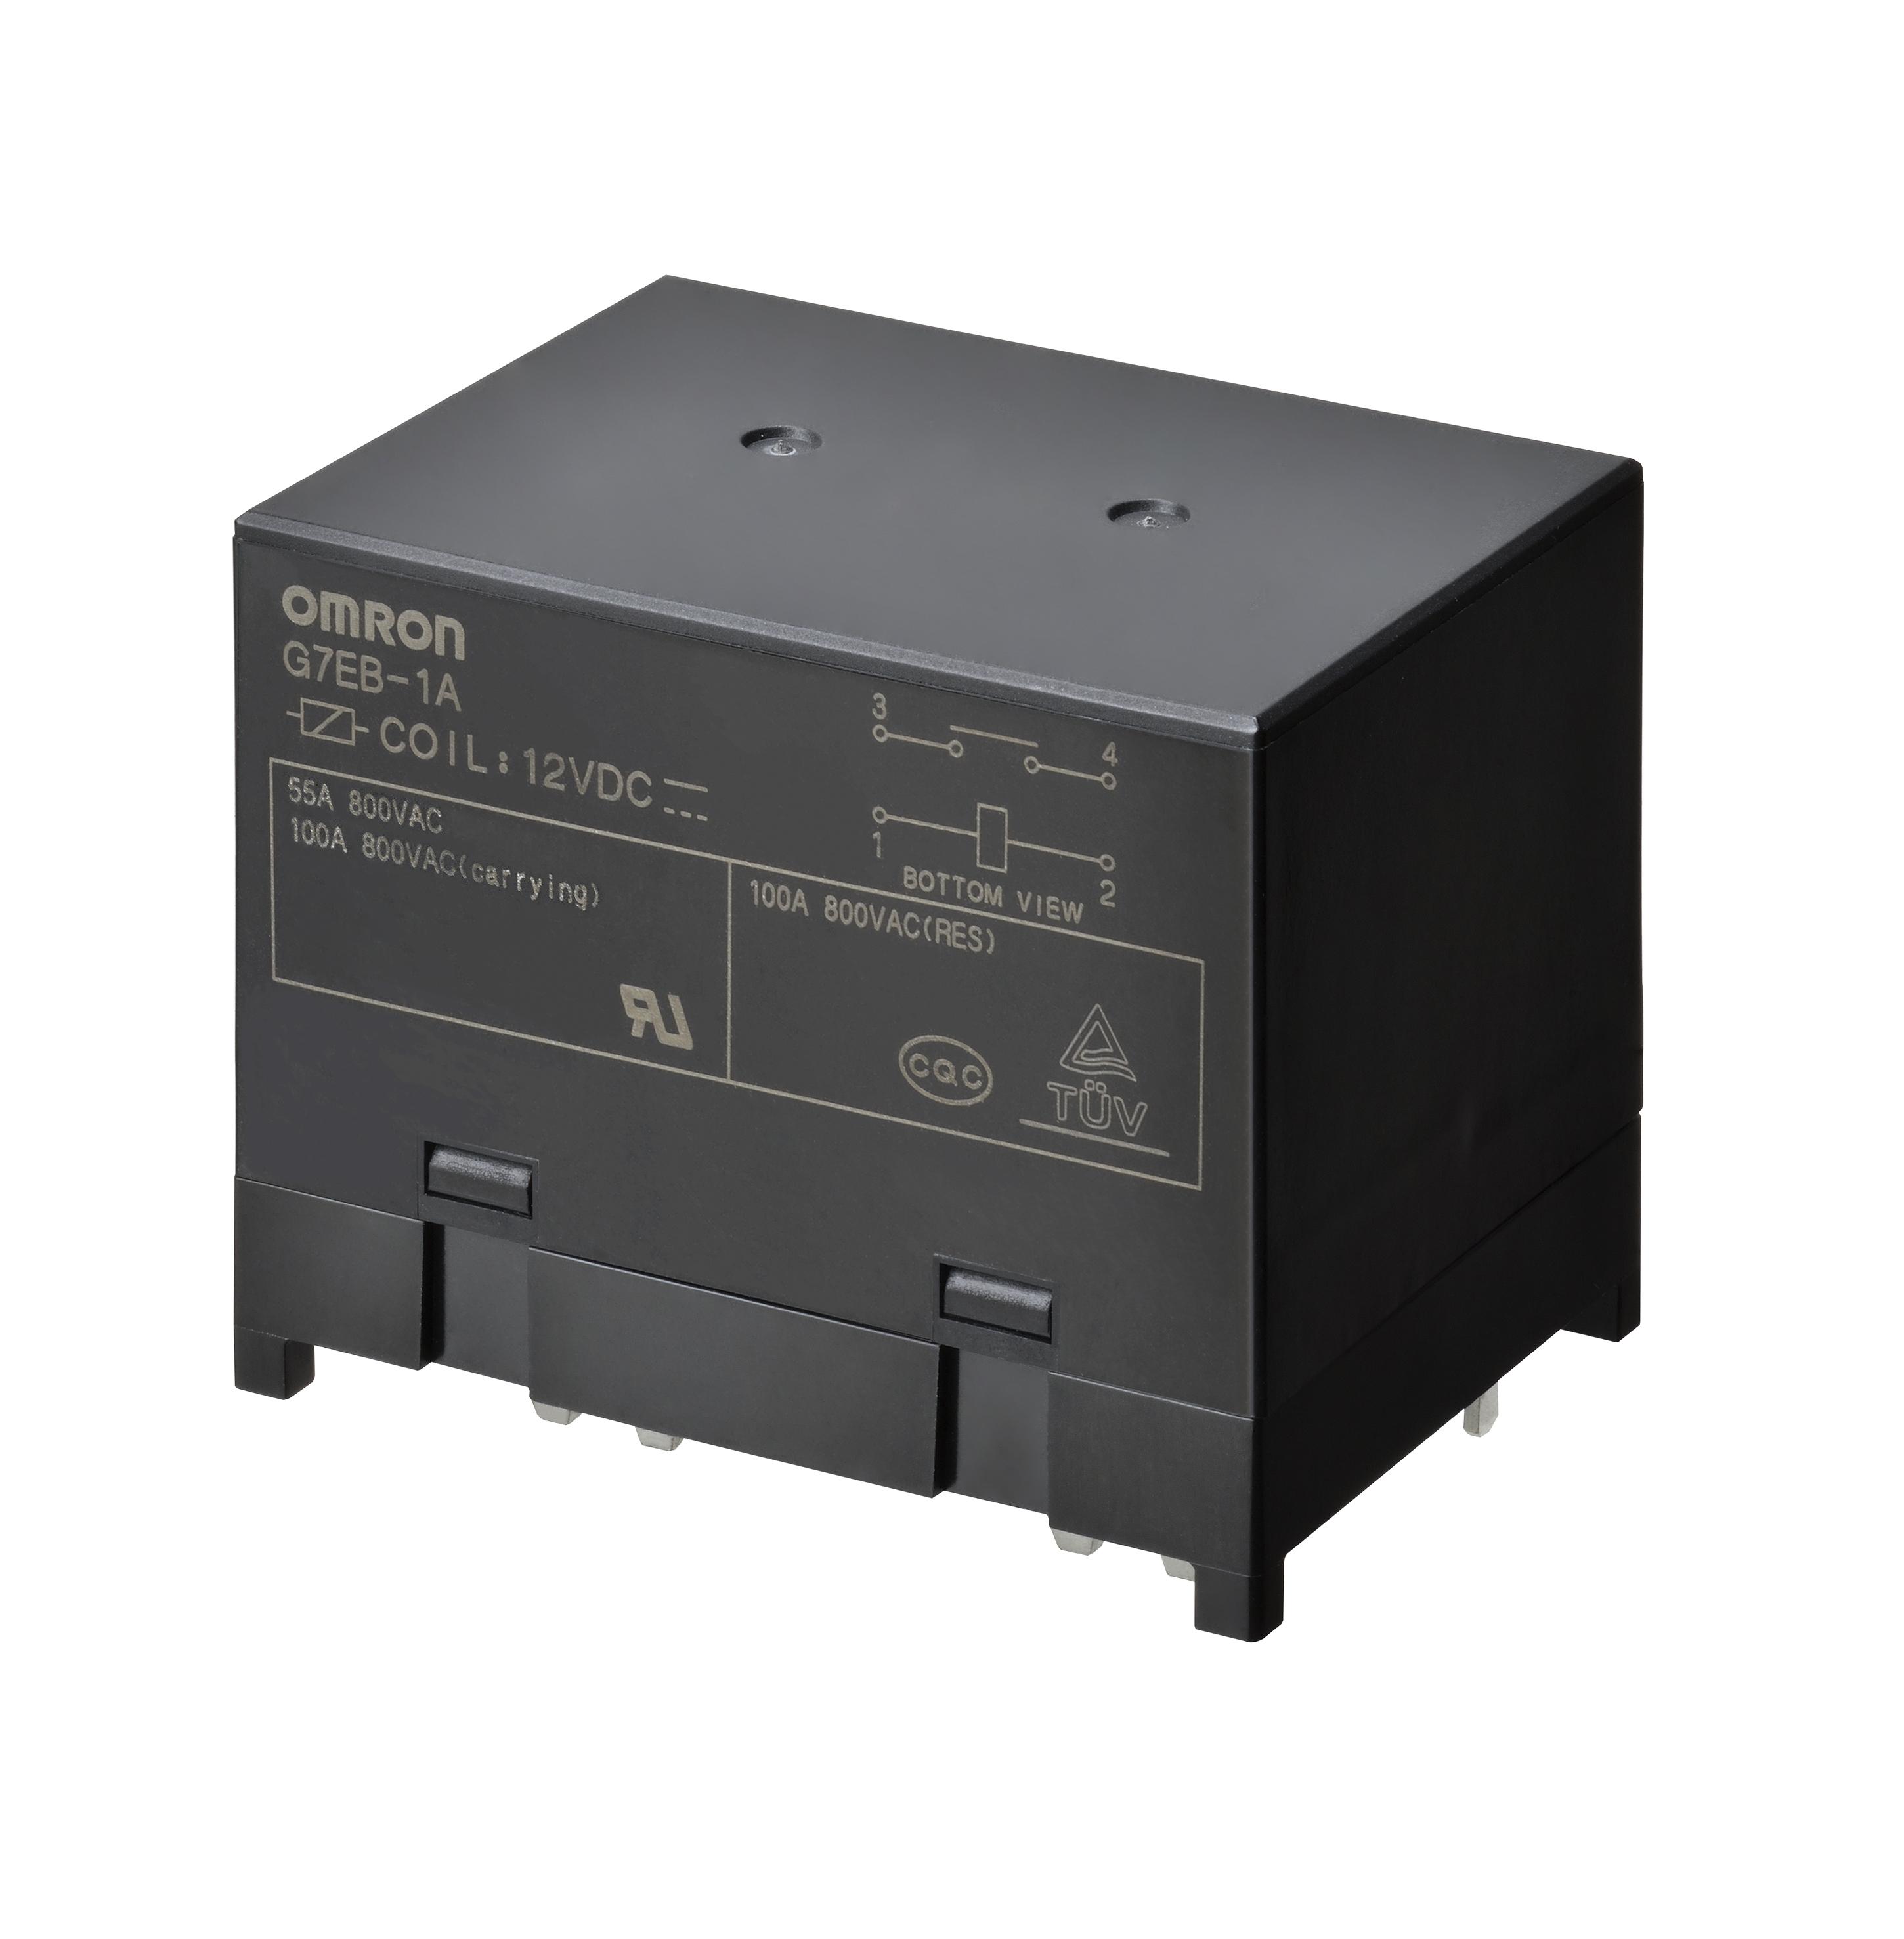 Datasheet Omron G7EB-1A DC12